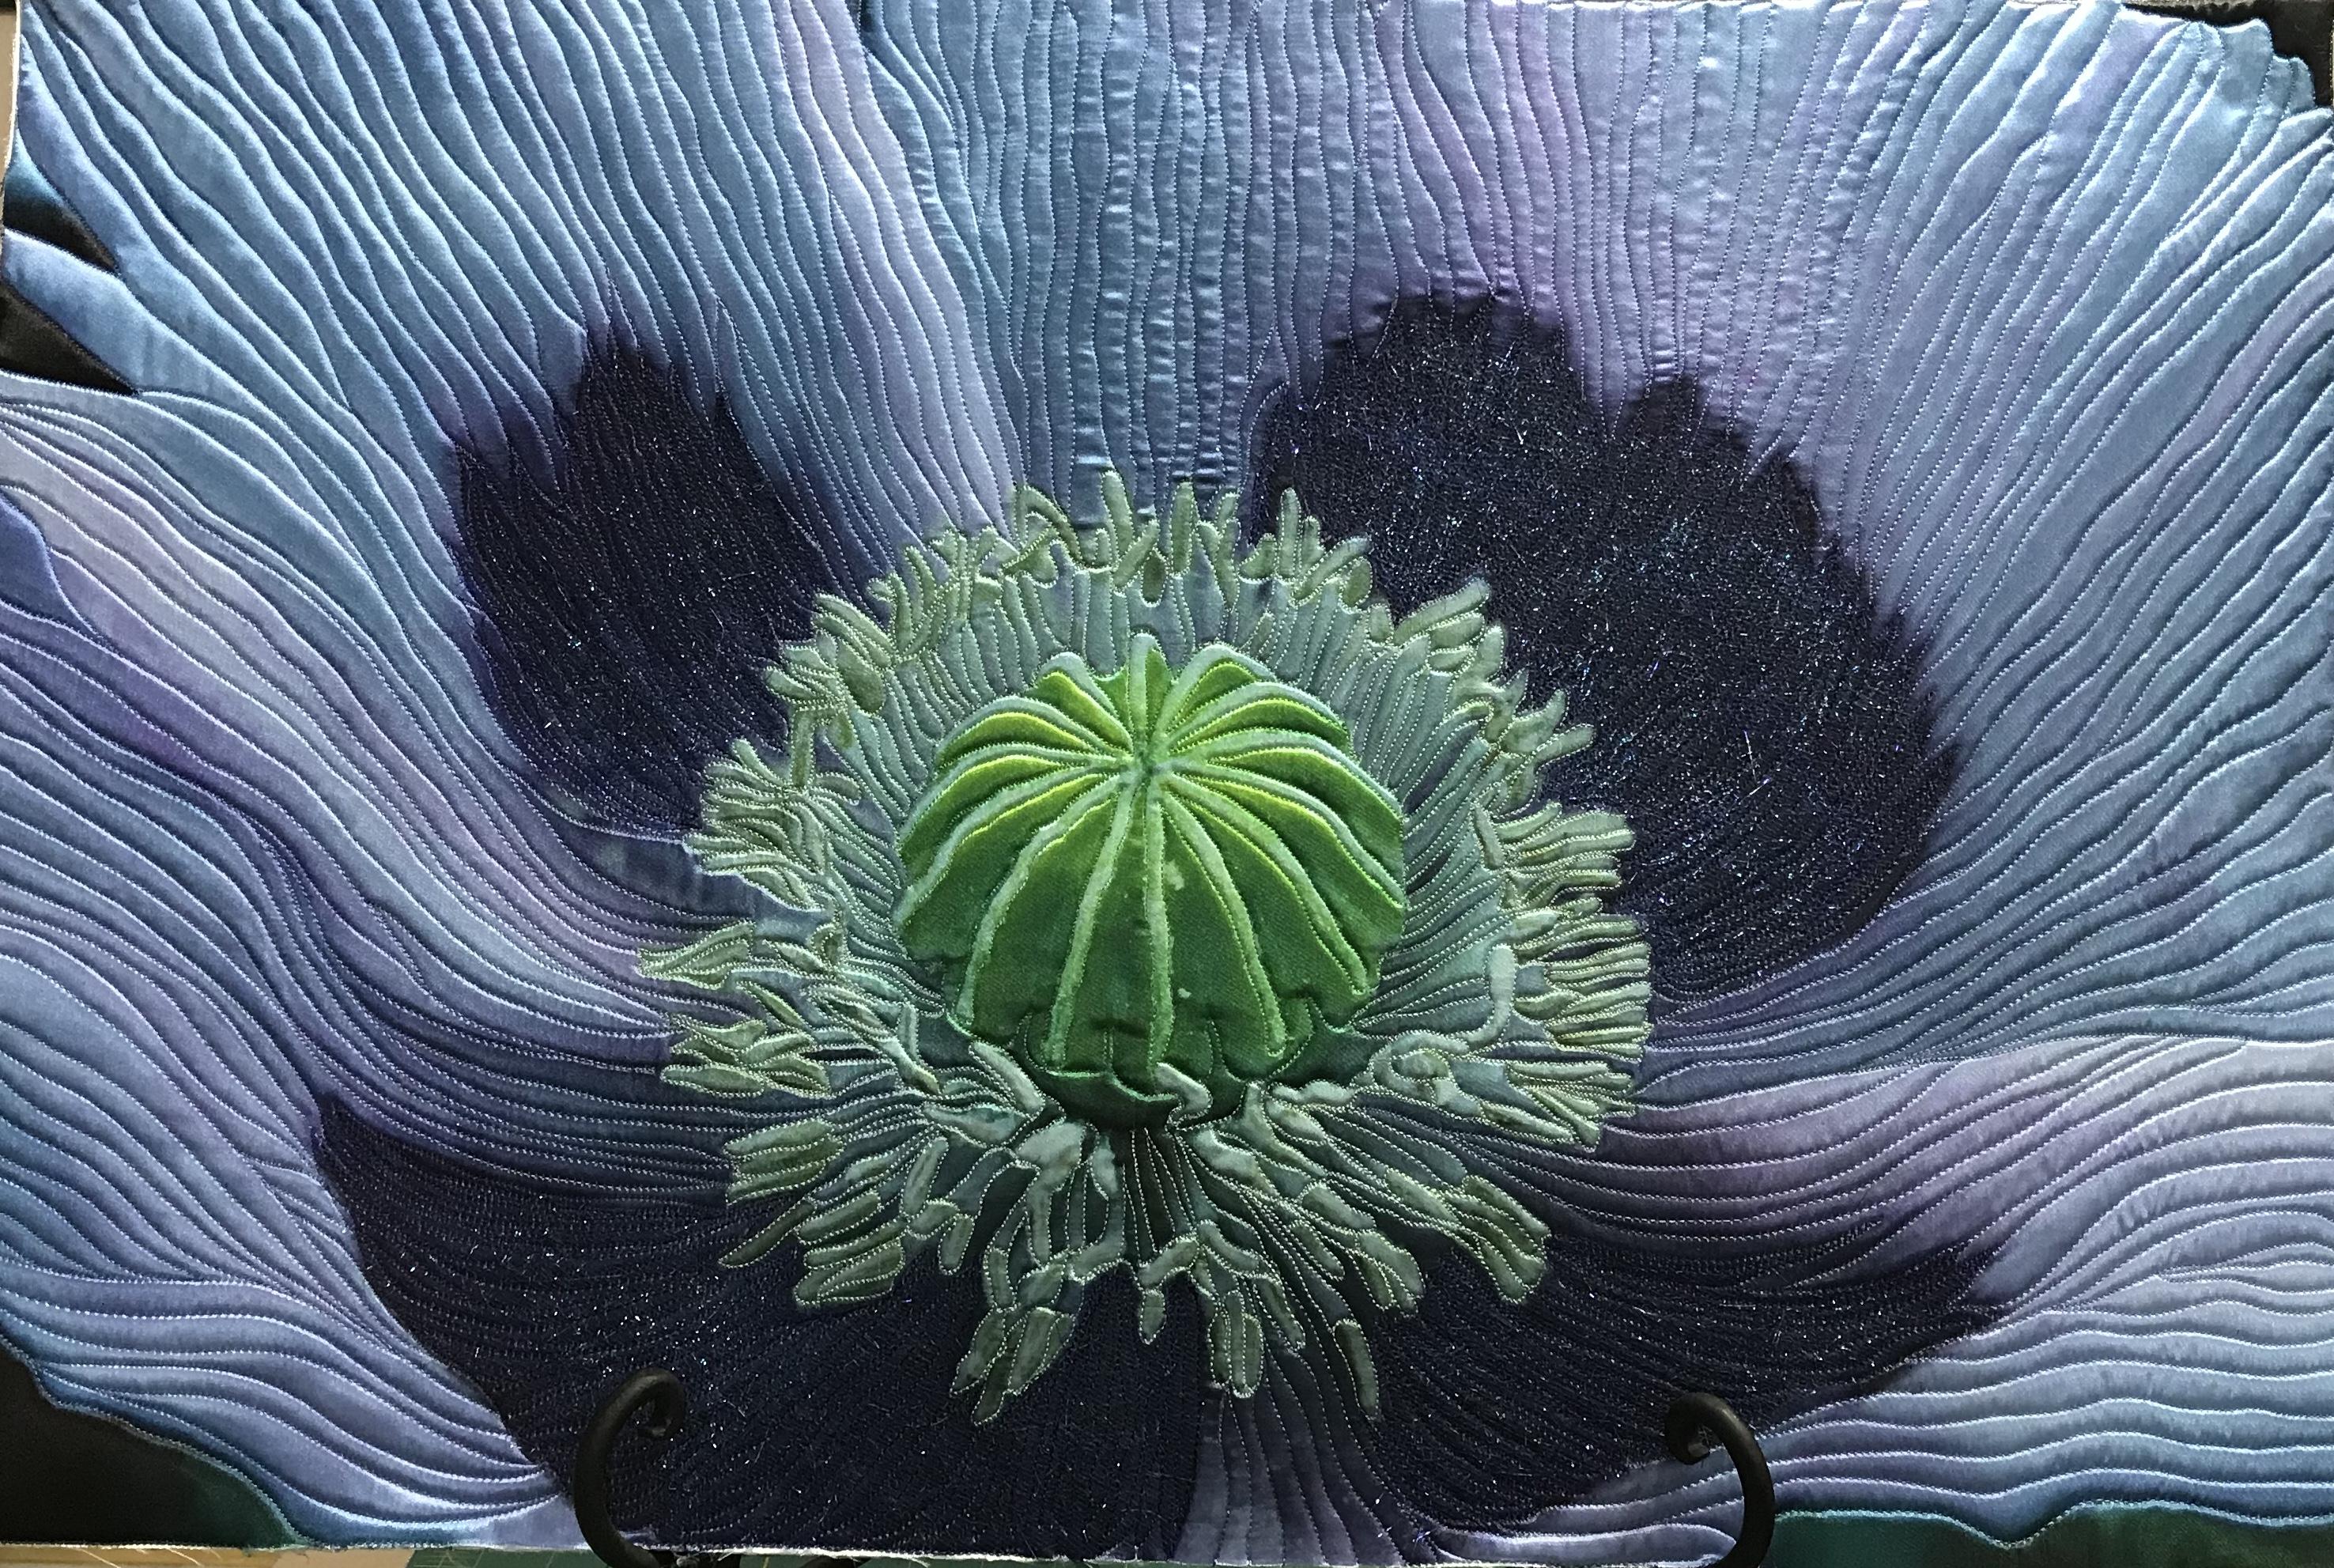 Blue Poppy by Teresa Schlabach